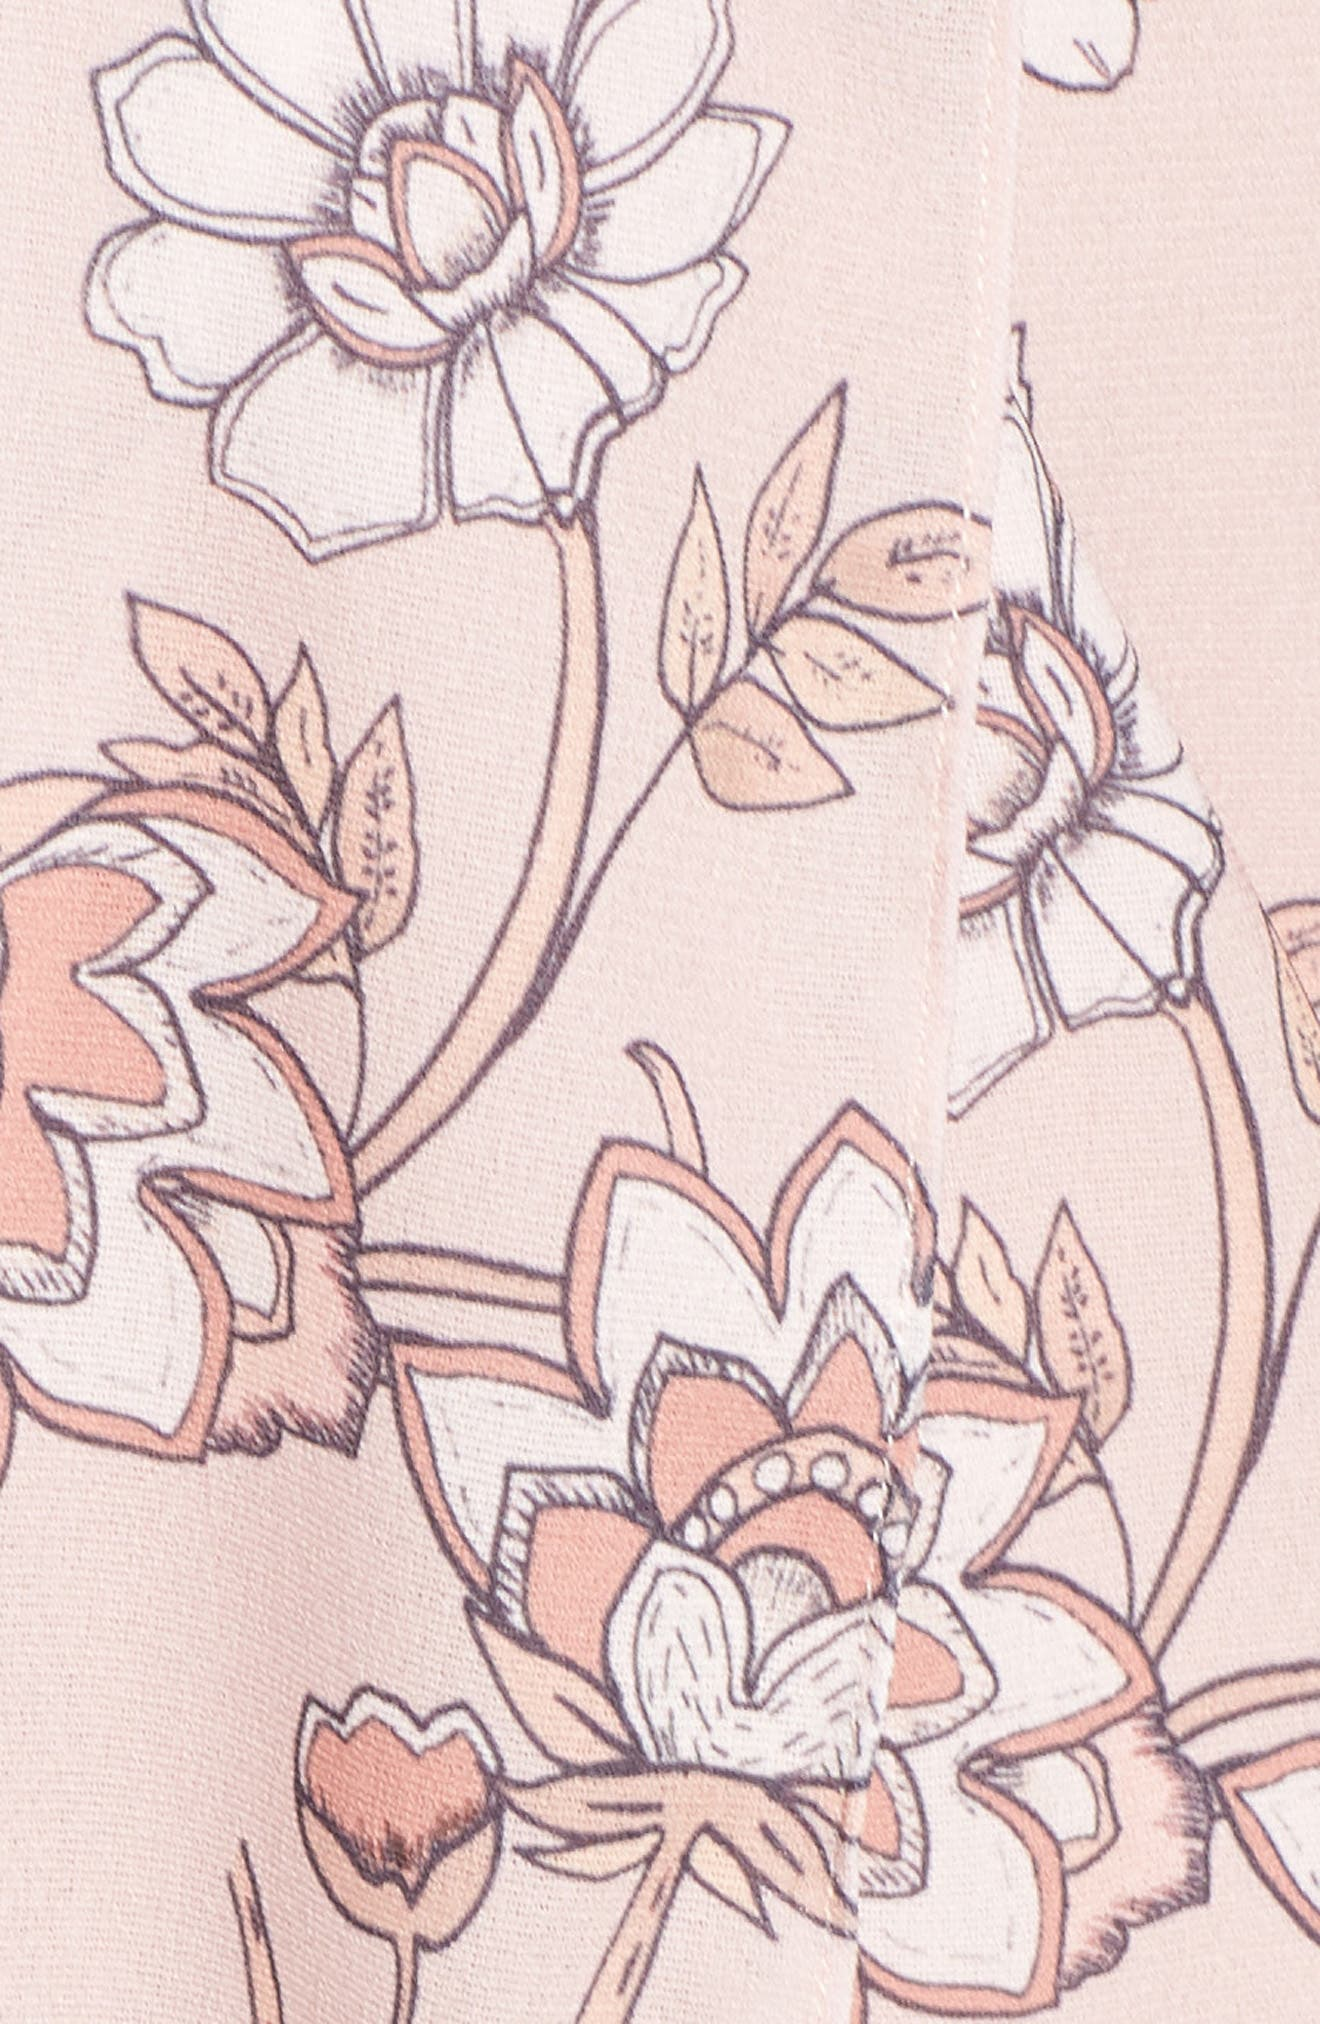 Fiorella Floral Drape Sheath Dress,                             Alternate thumbnail 6, color,                             650